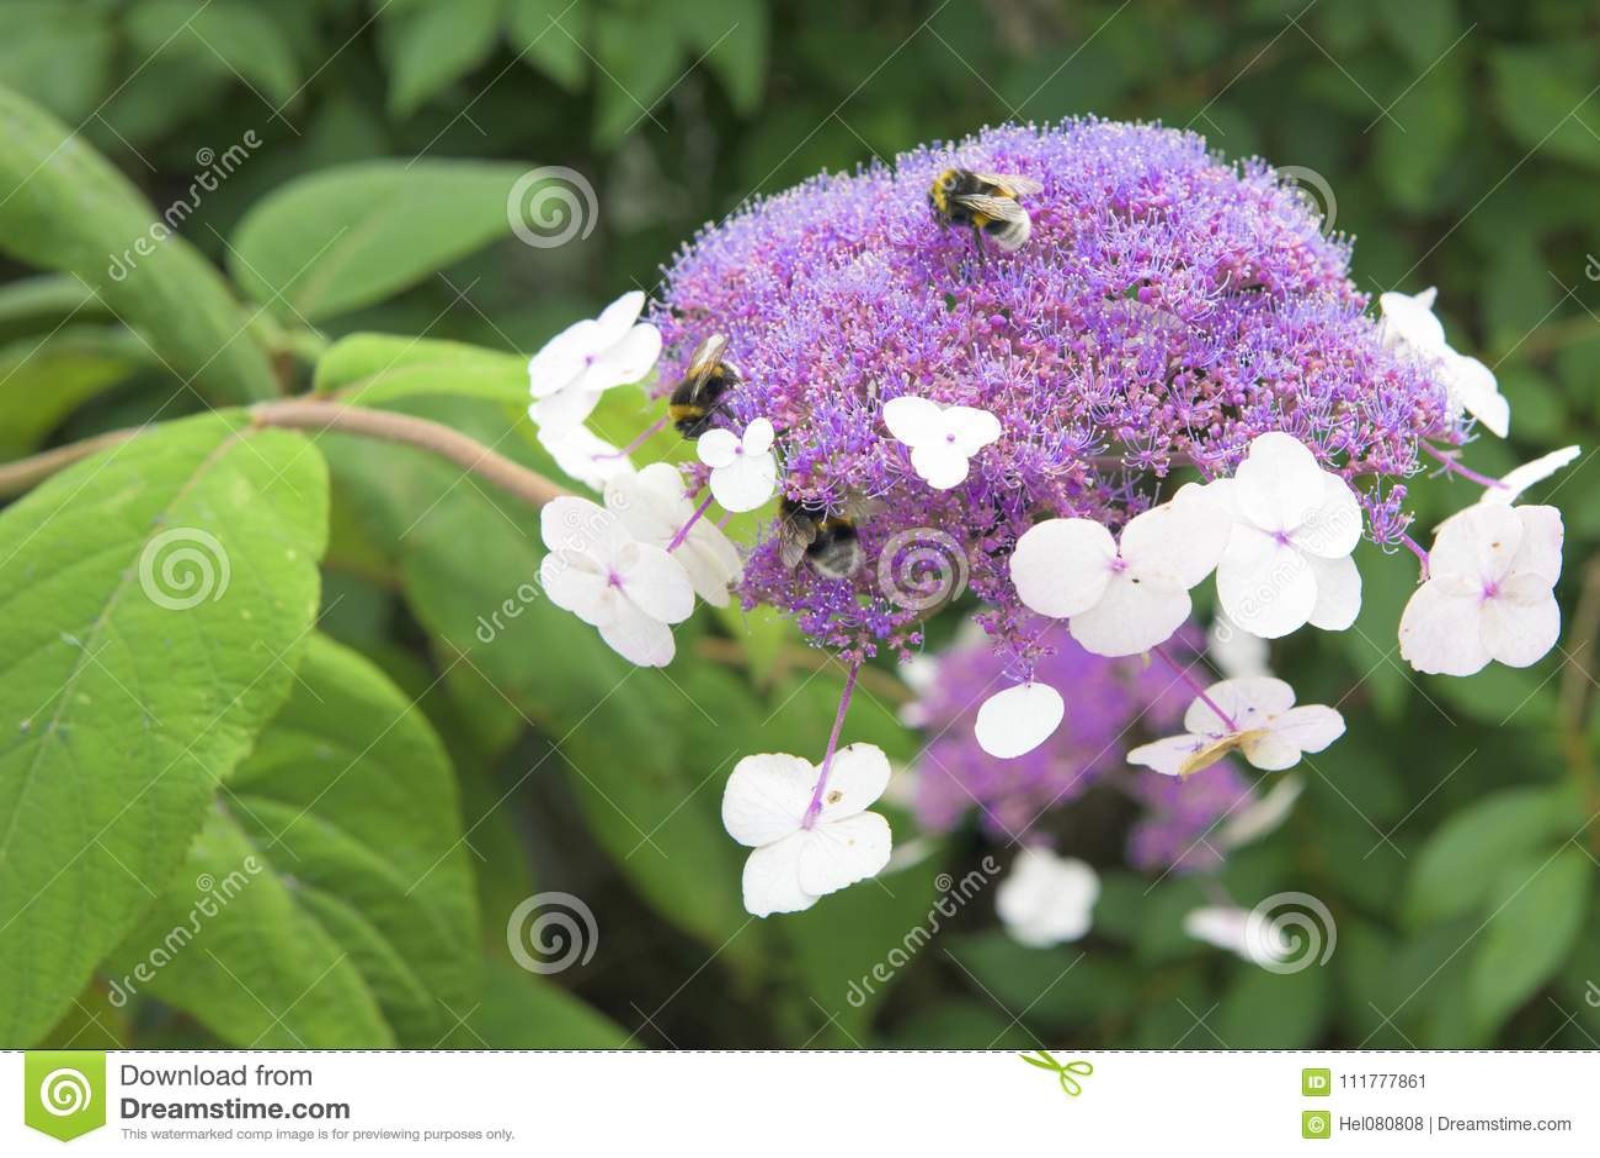 Violet hortensia - hydrangea macrophylla - laceap hydrangea